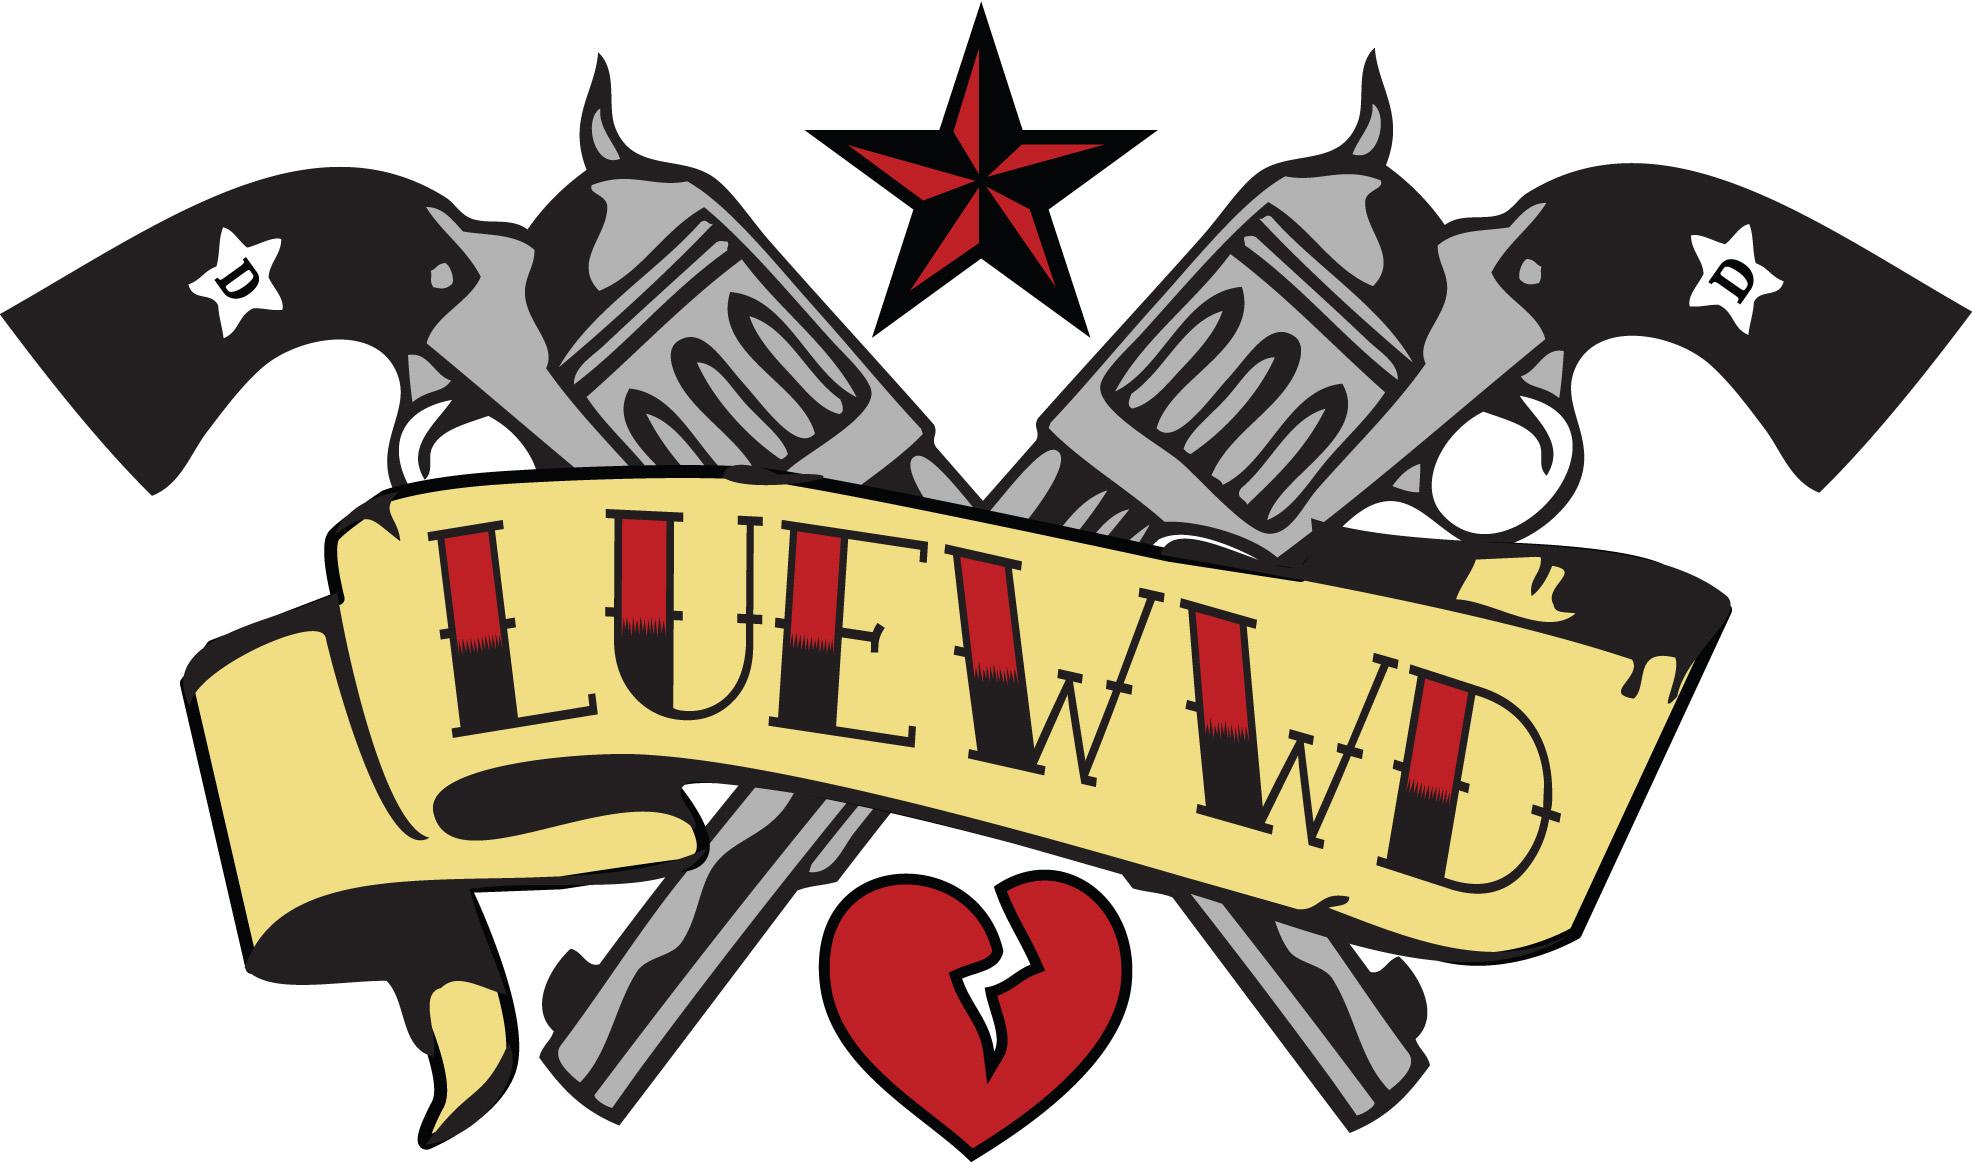 LUEWWD_logo_v1b